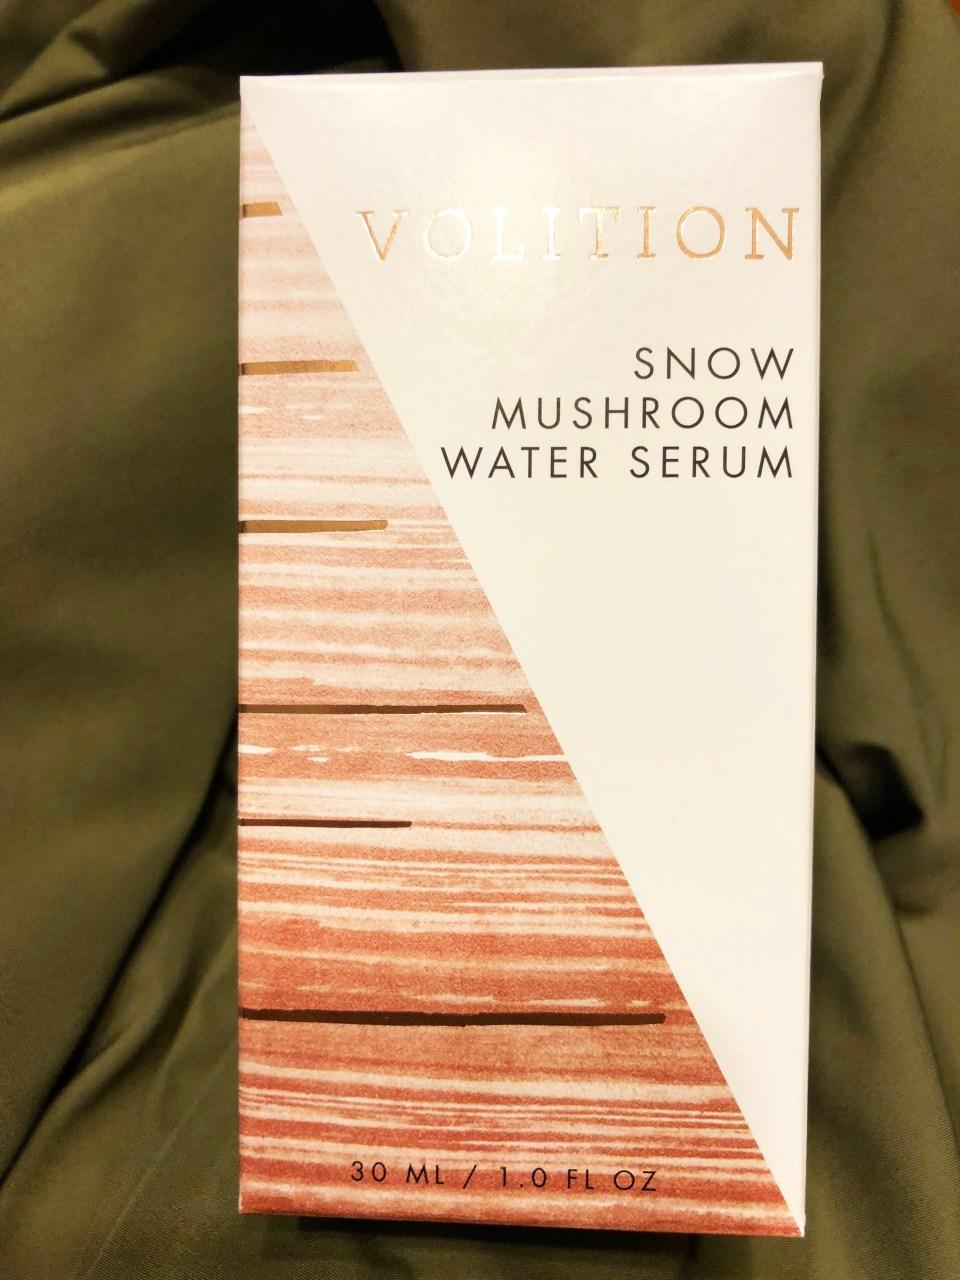 Snow Mushroom Water Serum 1